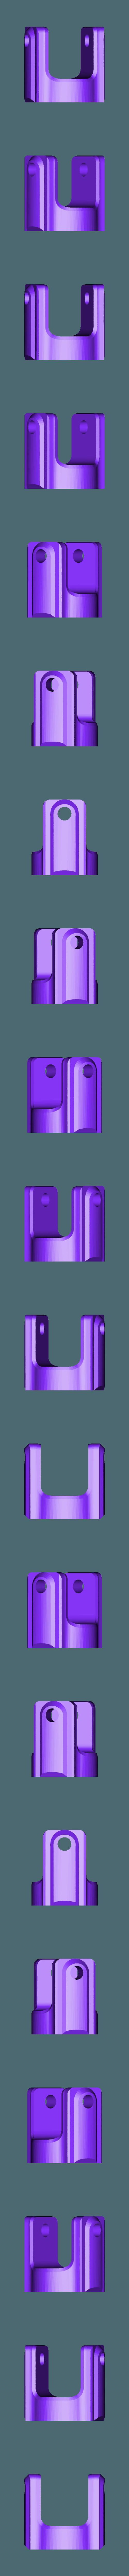 TruckV3_Axle_center_shaft_Ujoint_A.STL Download STL file 3D Printed RC Truck V3 • 3D print model, MrCrankyface